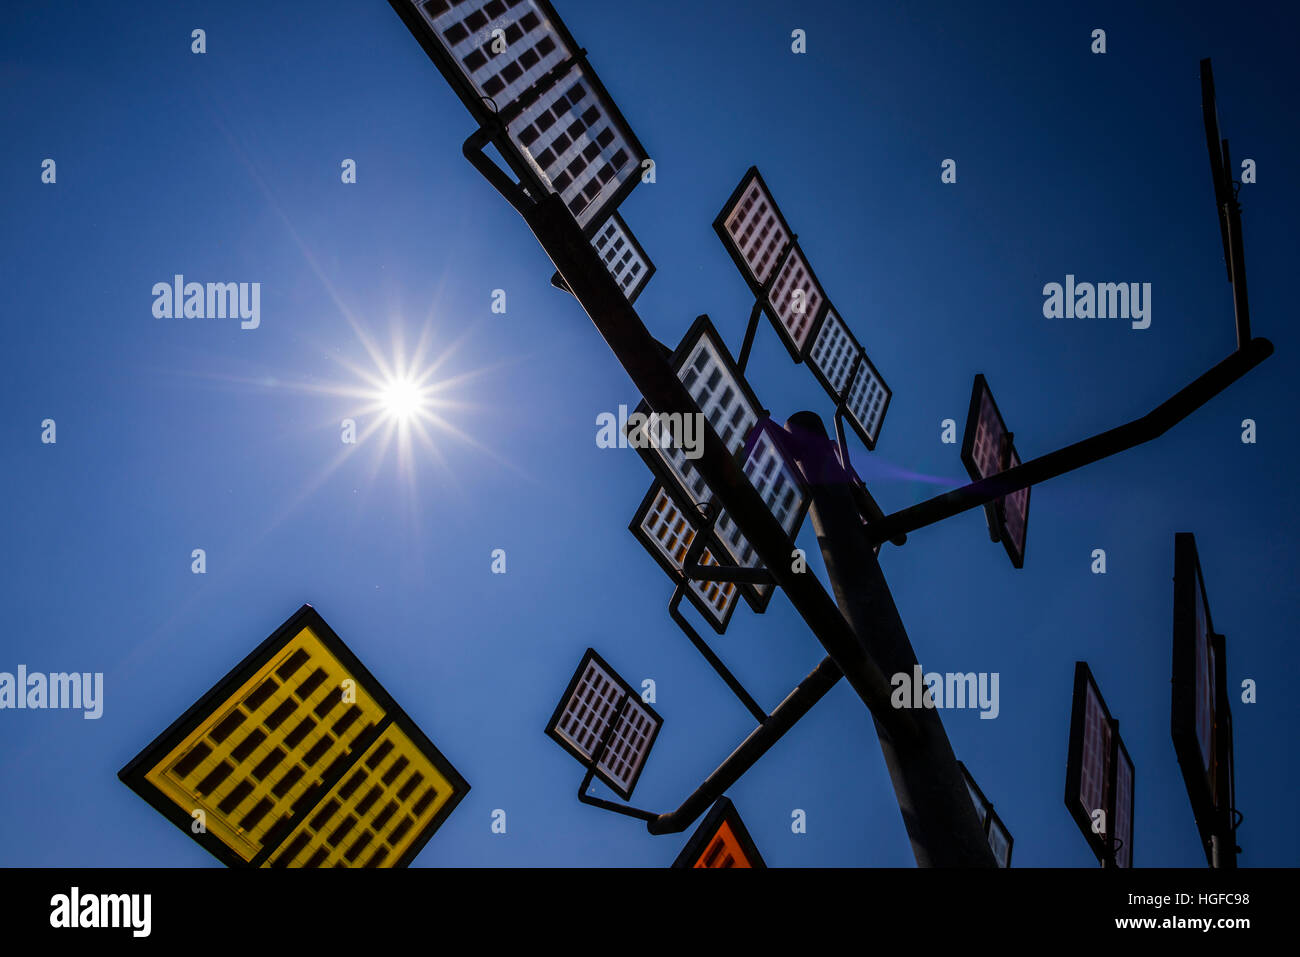 solar panels, Solarbaum, Ulmer Wohnviertel Solar City, Ulm, - Stock Image